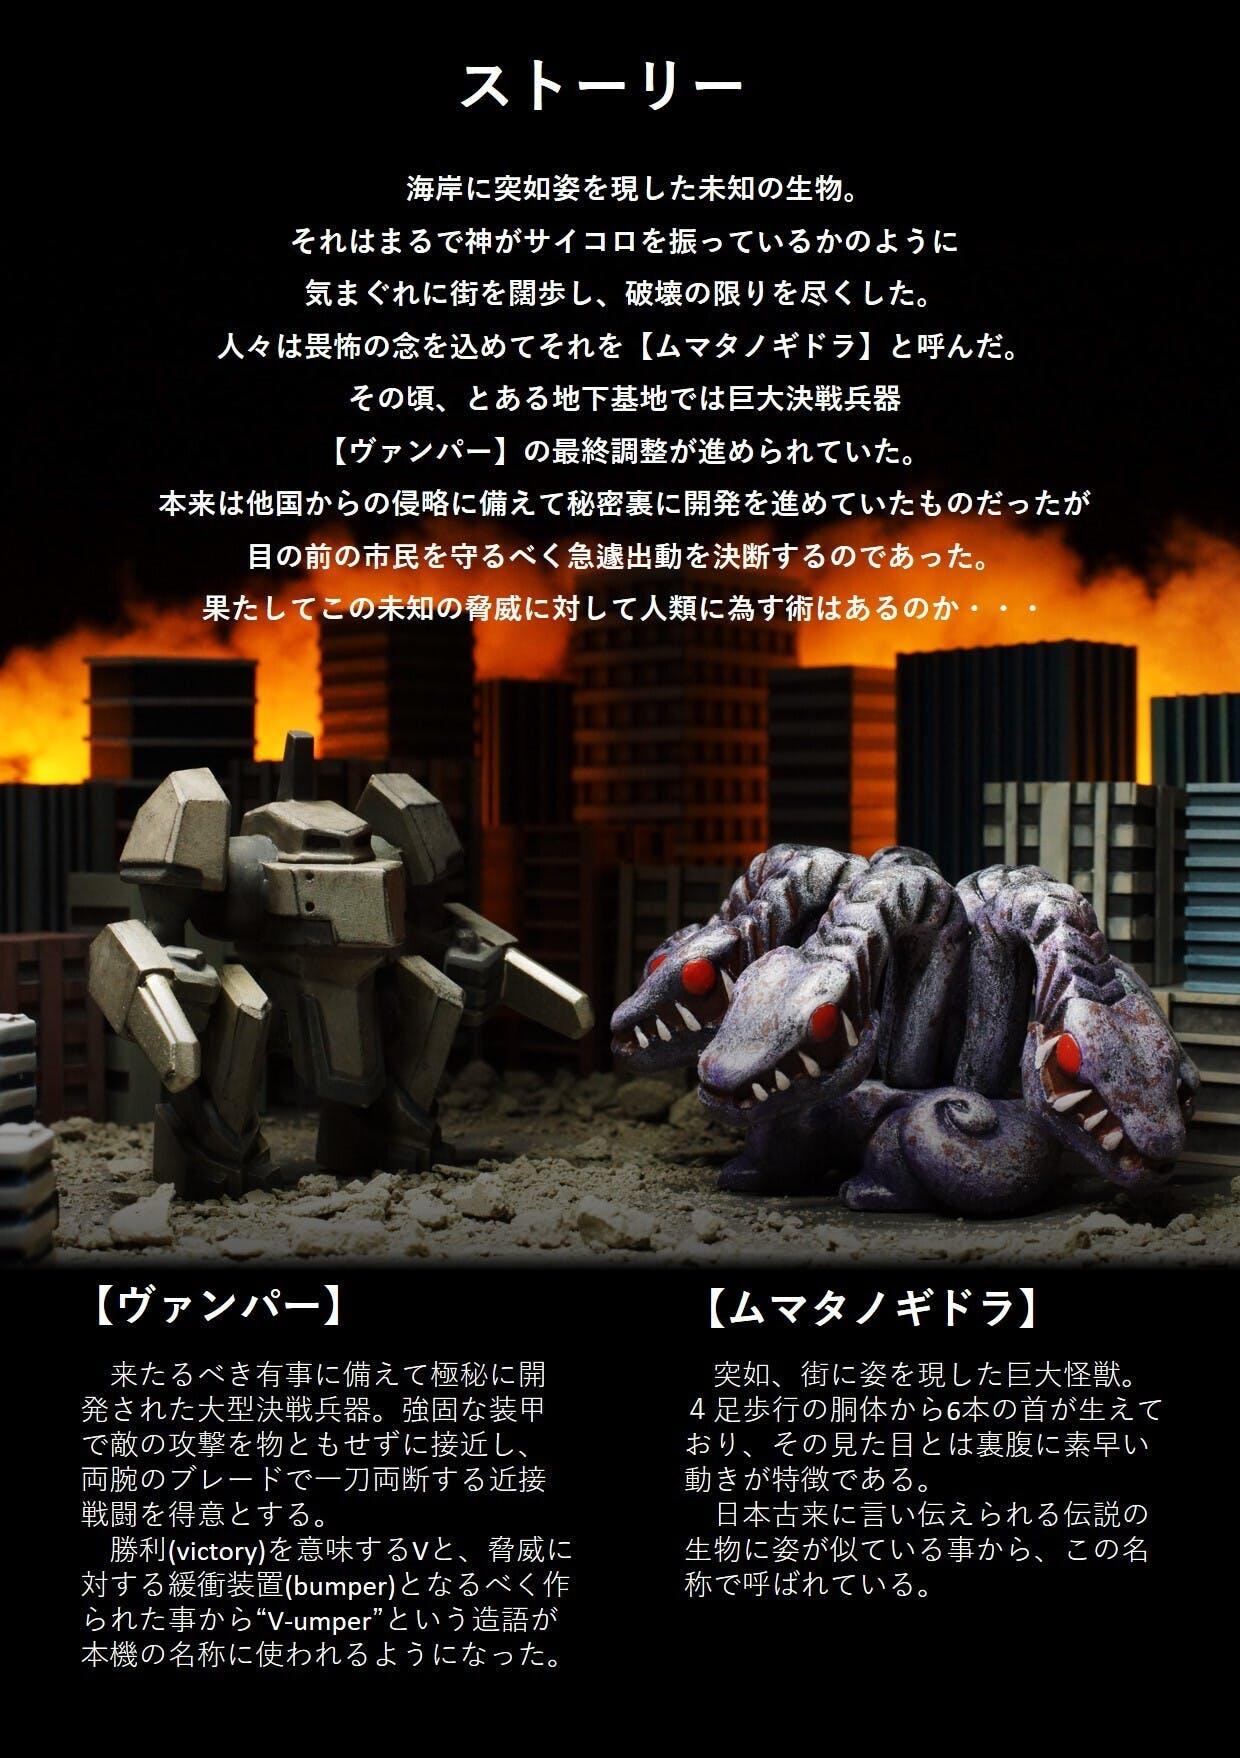 https://static.camp-fire.jp/uploads/editor_uploaded_image/image/905855/96364c71b52968c55d49b747a4819378.jpg